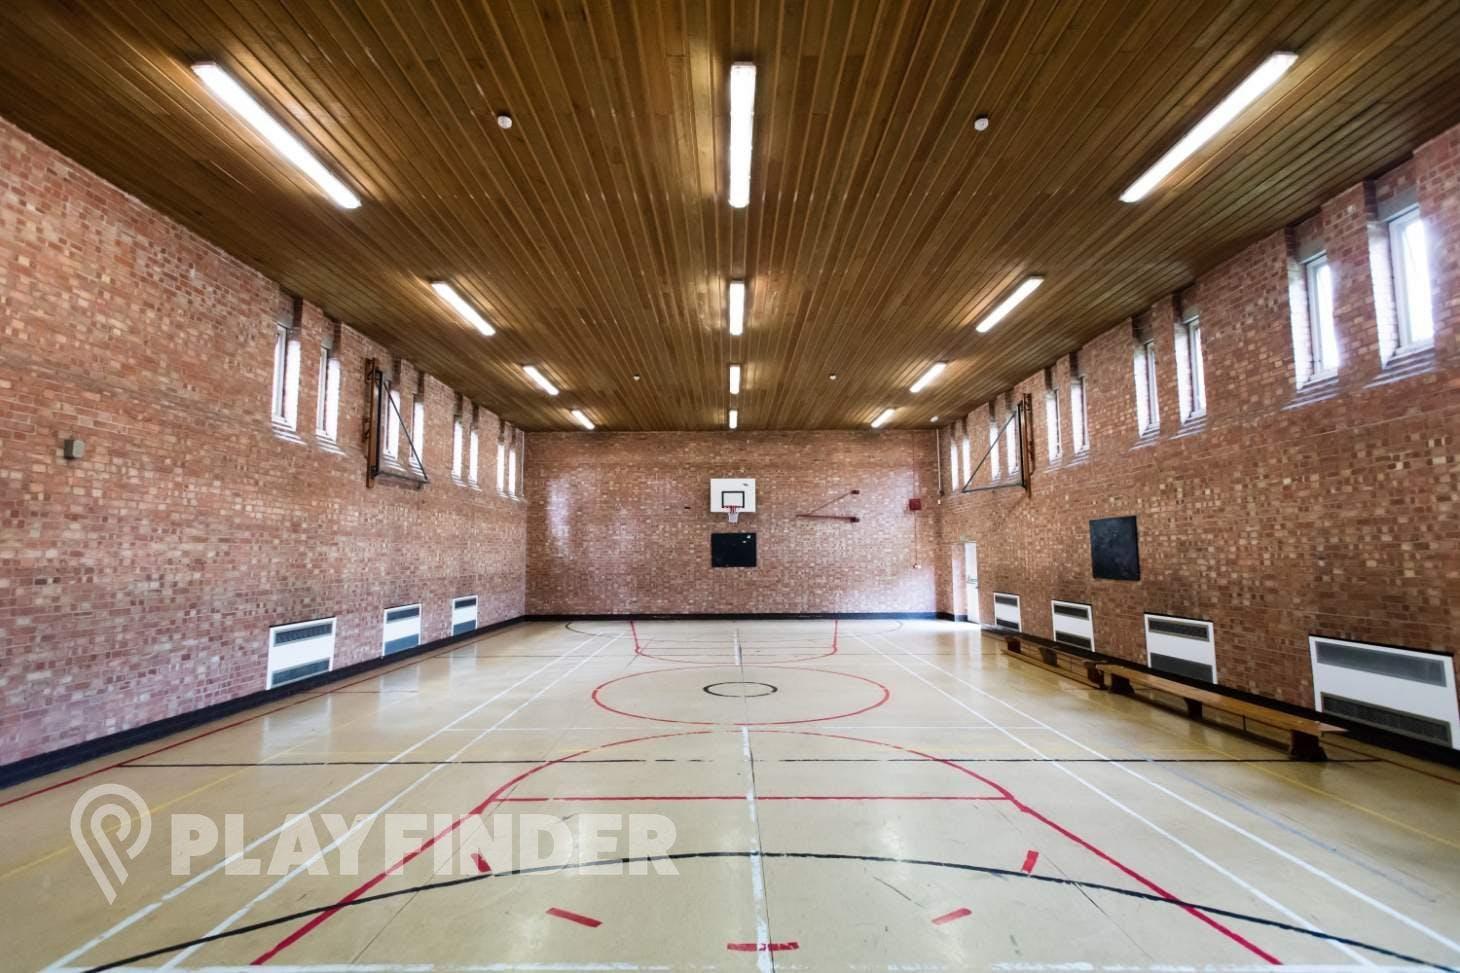 Marcus Lipton Community Enterprise Court | Sports hall volleyball court